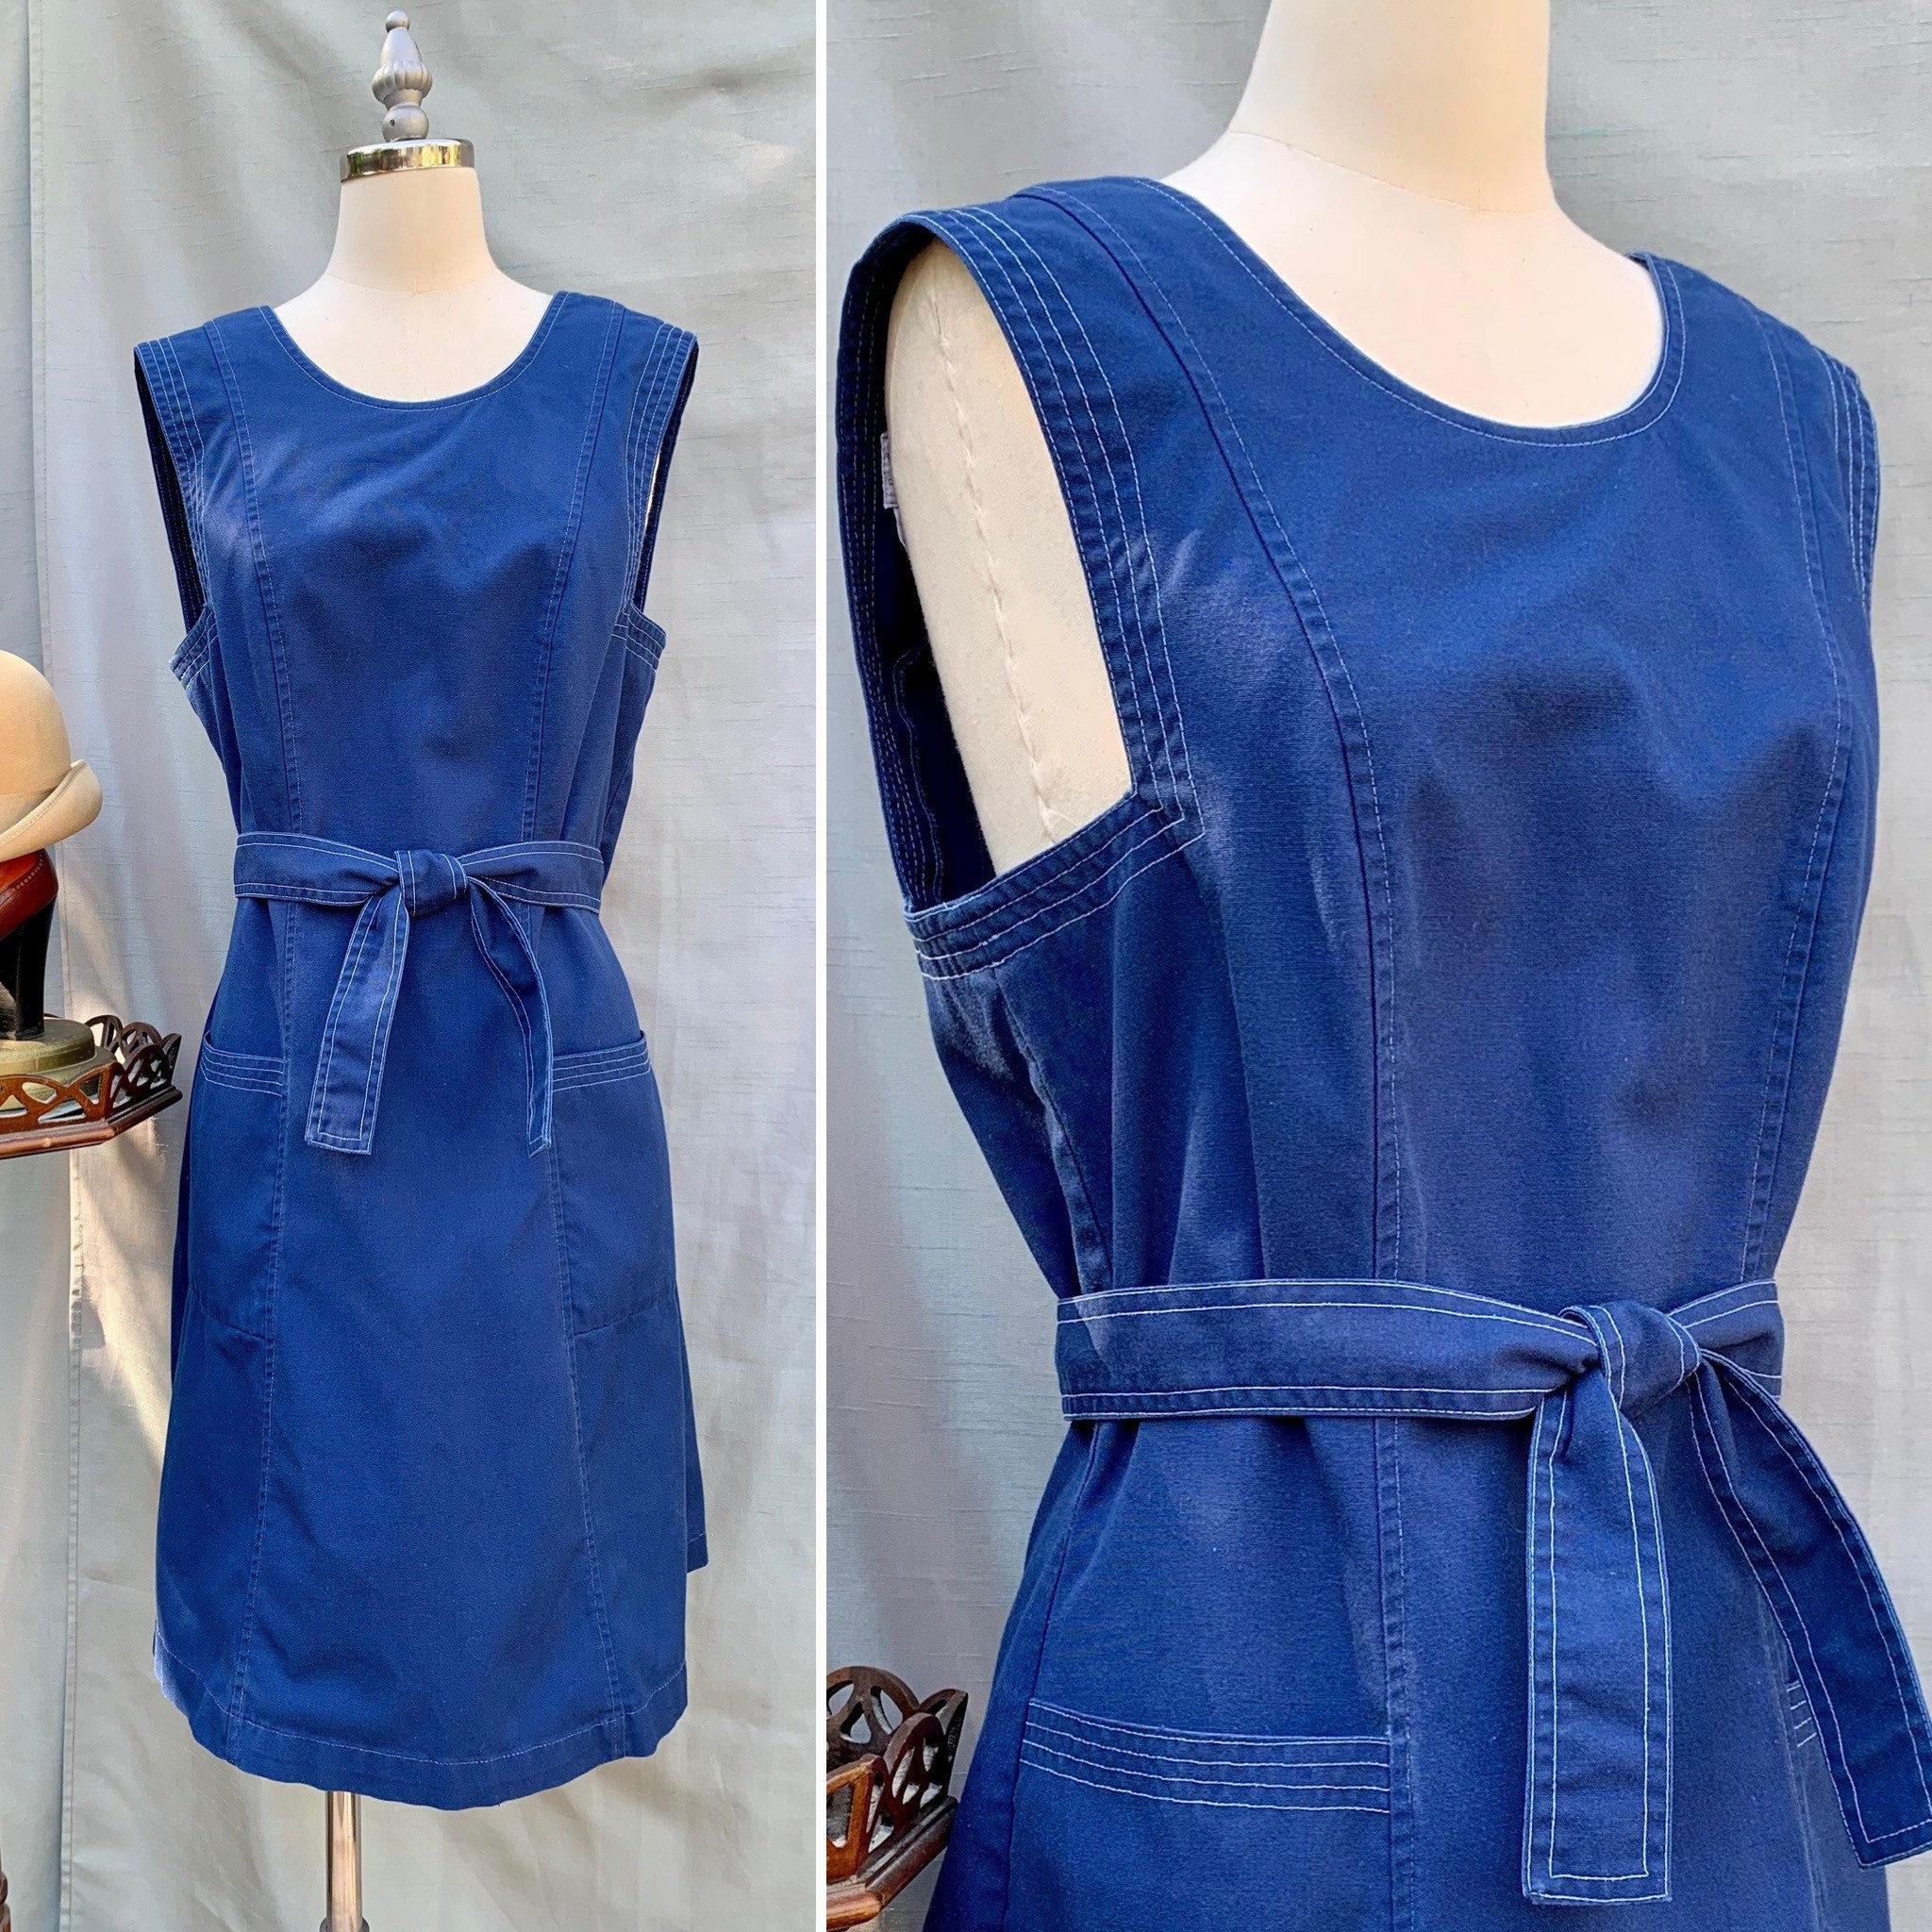 Vintage Aprons, Retro Aprons, Old Fashioned Aprons & Patterns Vintage 70S Edith Head For Pan Am Airlines Uniform Wrap Dress, S, M $98.00 AT vintagedancer.com